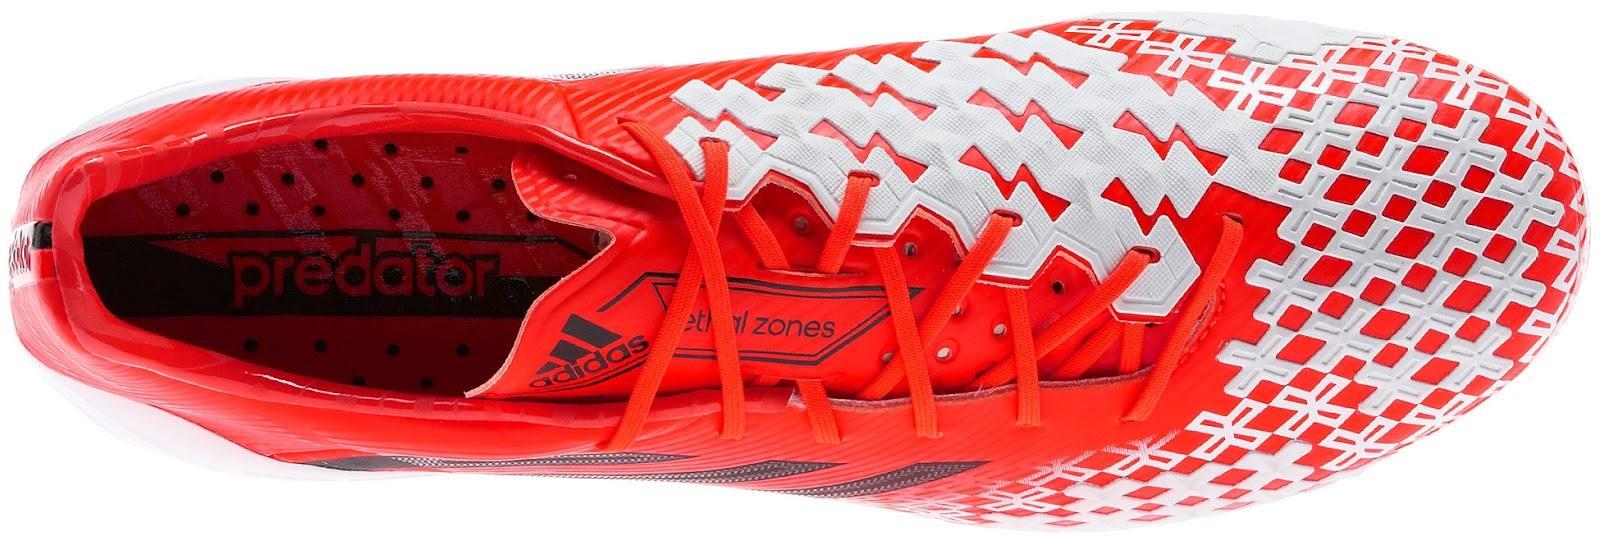 Adidas-Predator-LZ-II-Boots-Red-White-SL-4